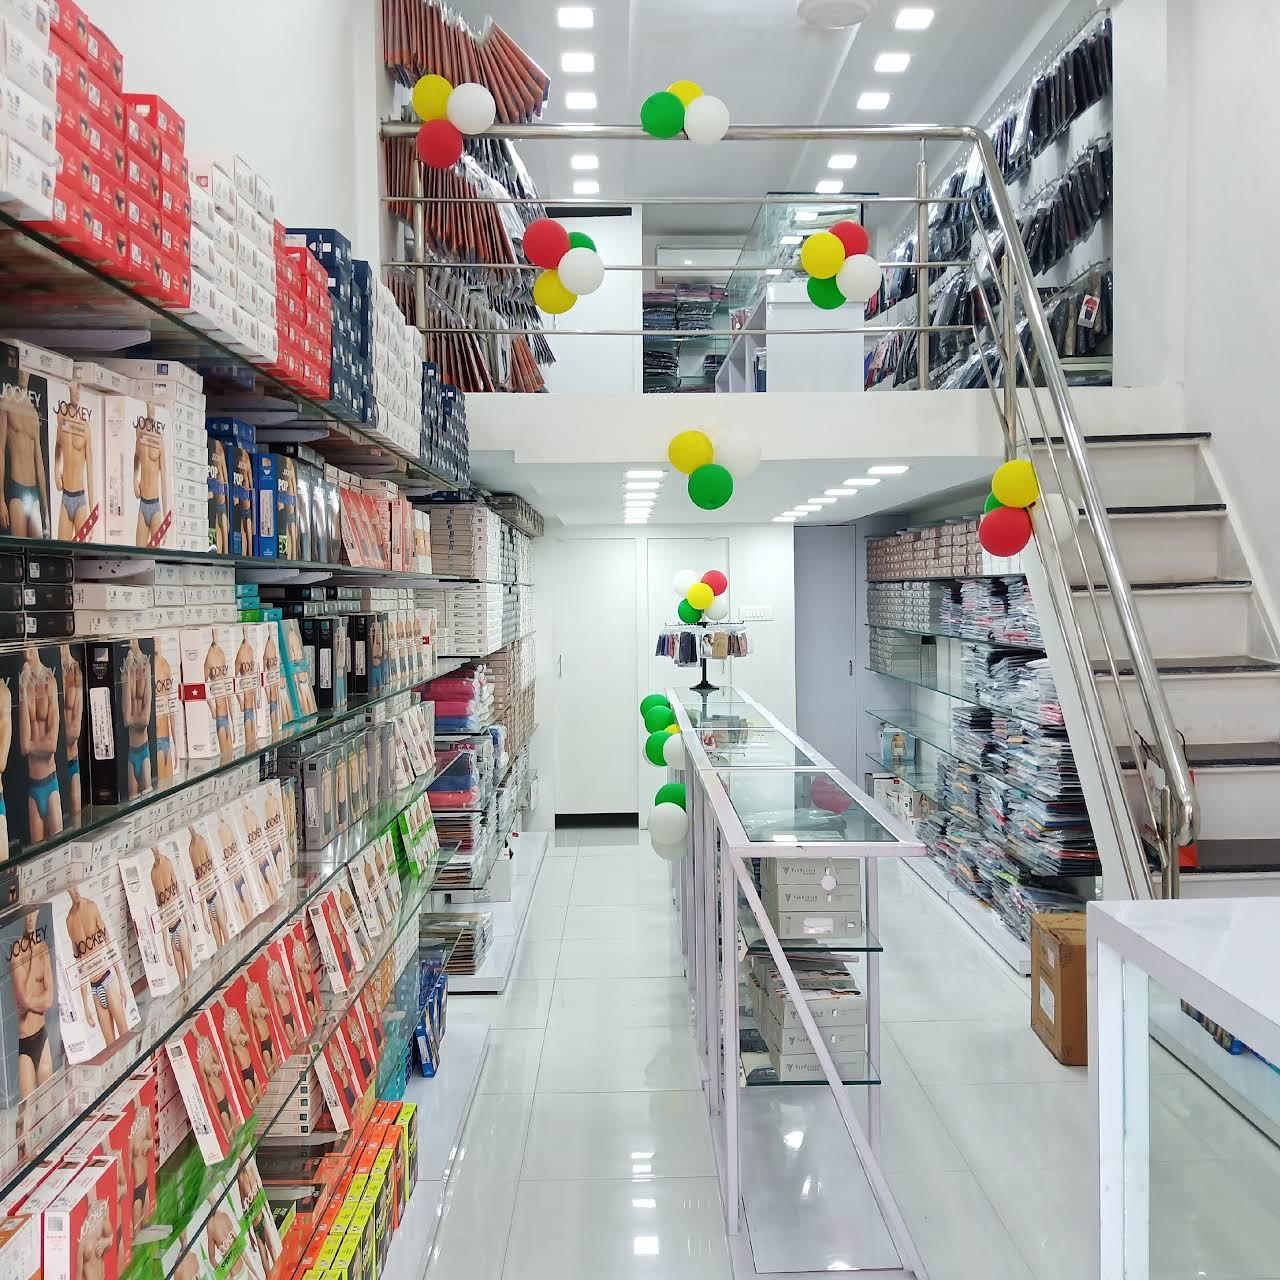 TANVISH 7 JOCKEY - Underwear Store in PANVEL